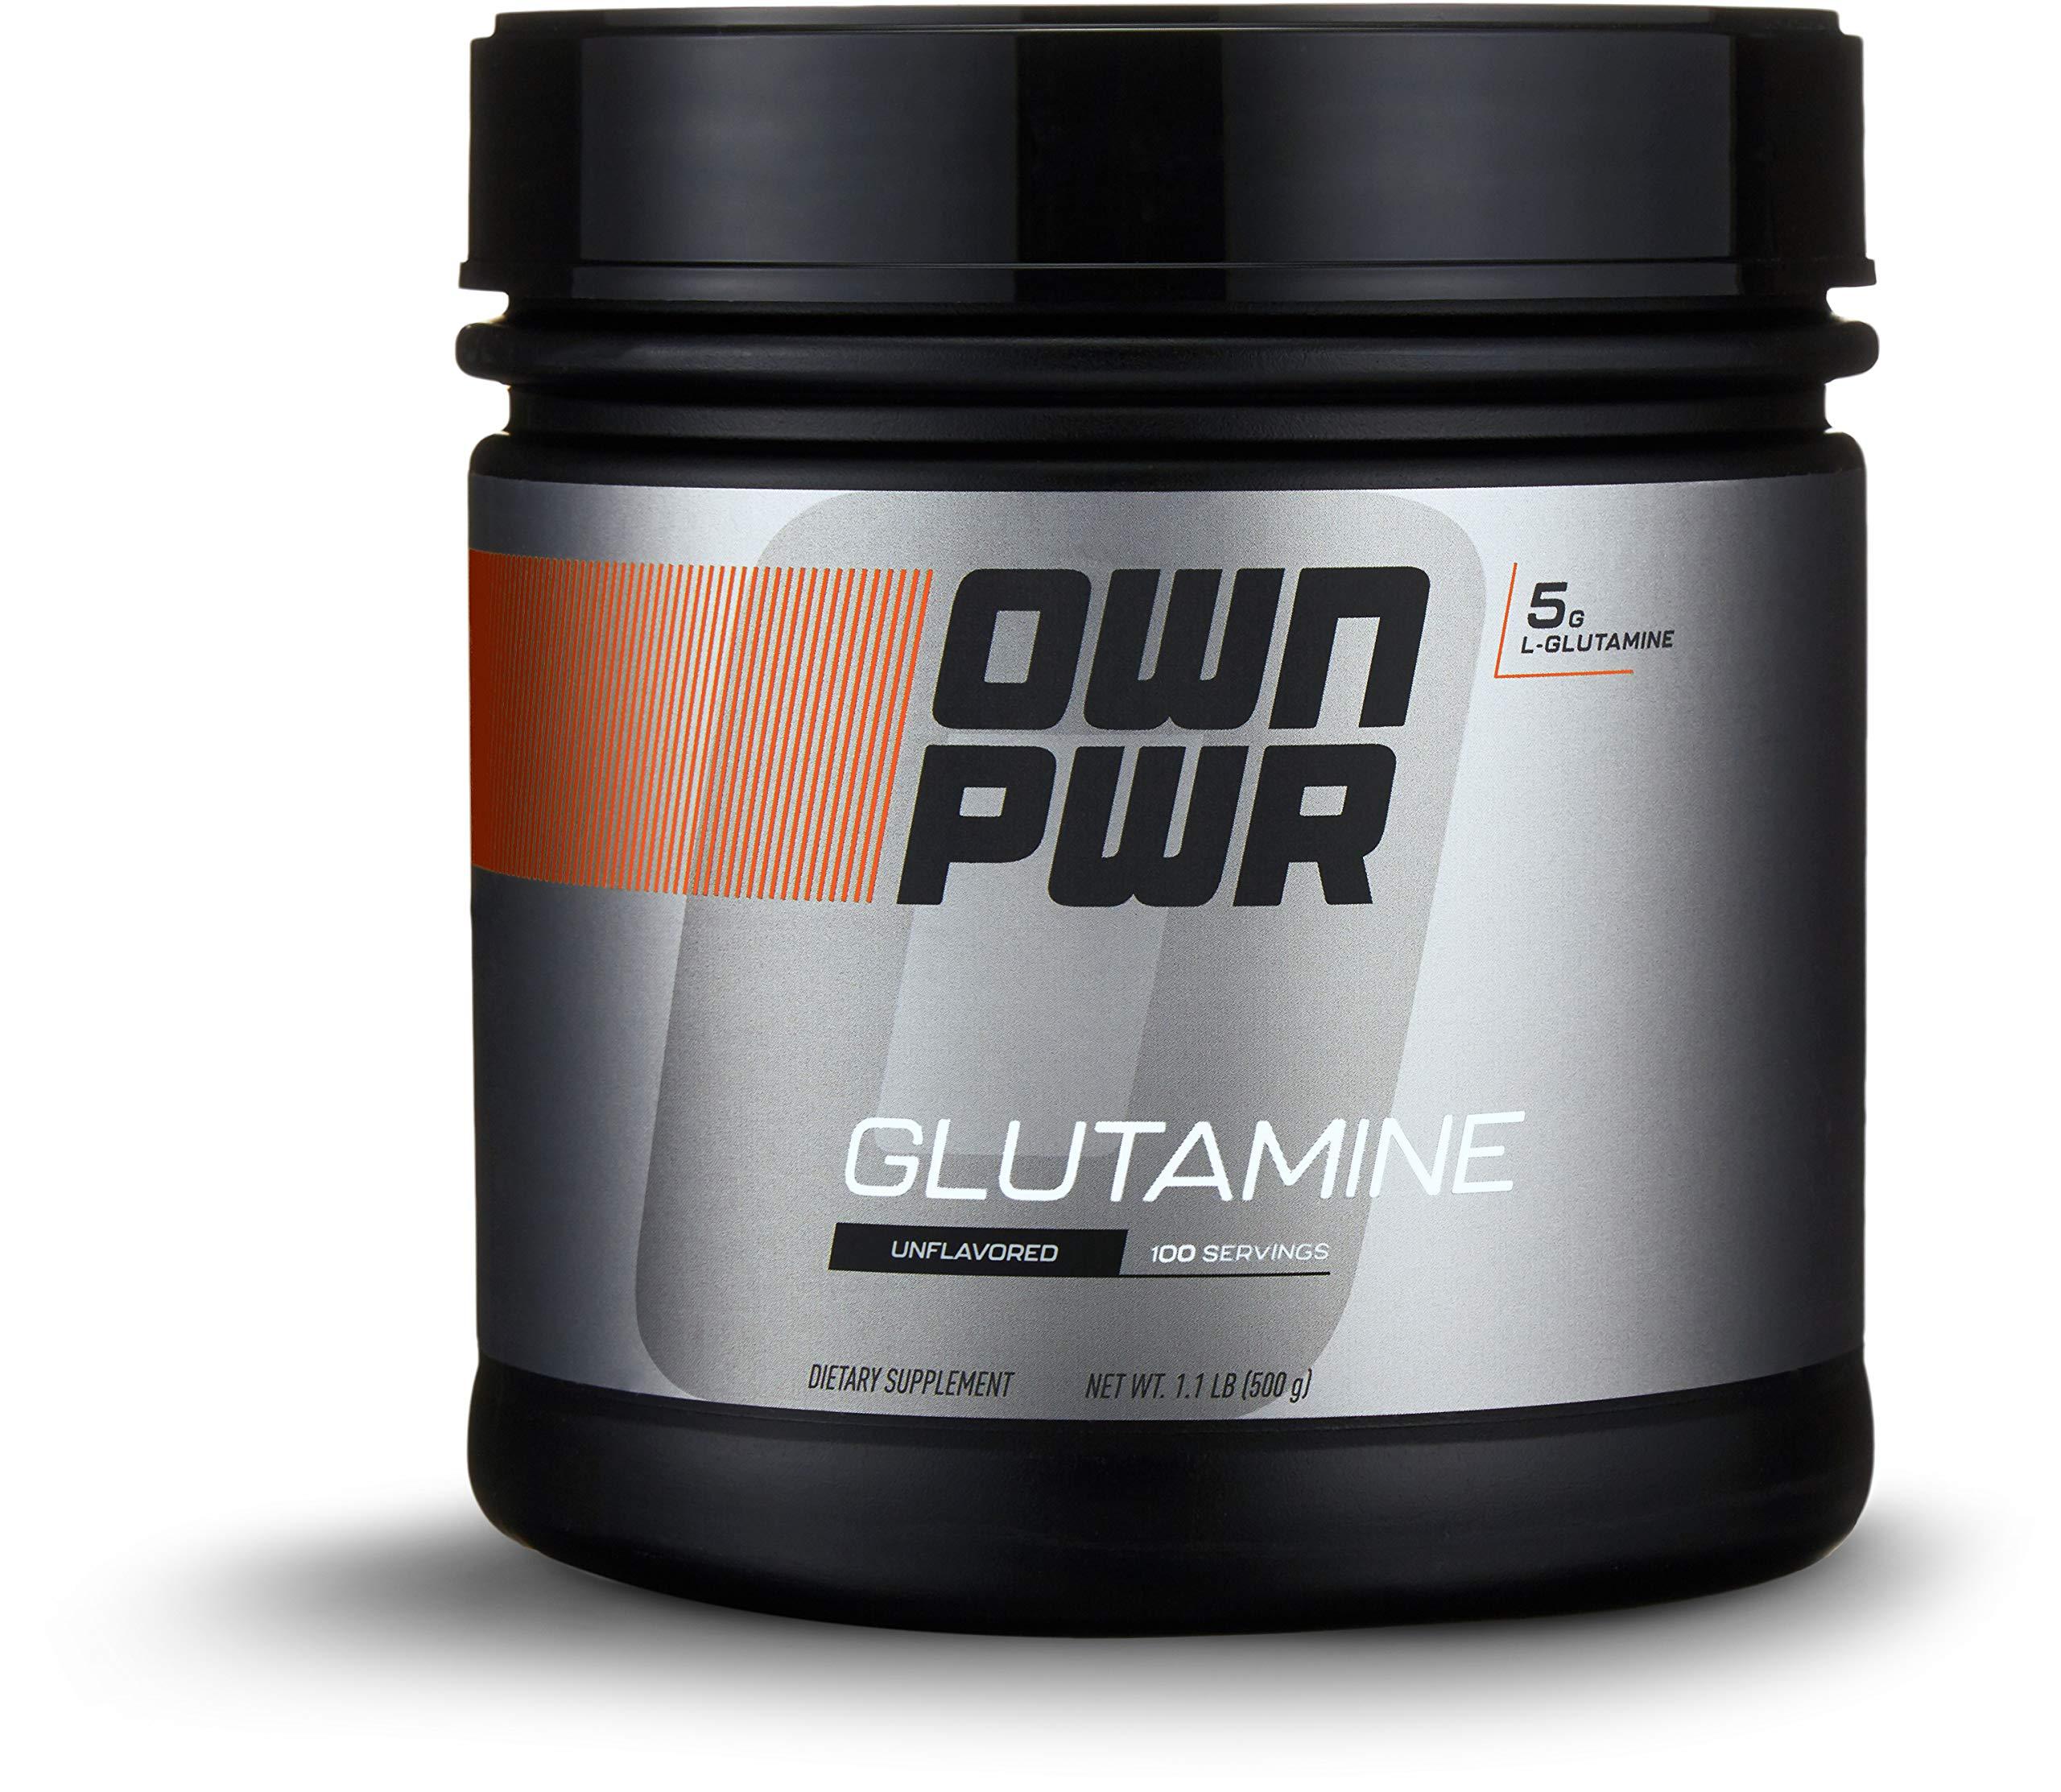 OWN PWR L-Glutamine Powder, Unflavored, 5 G, 1.1 Pound (100 Servings)